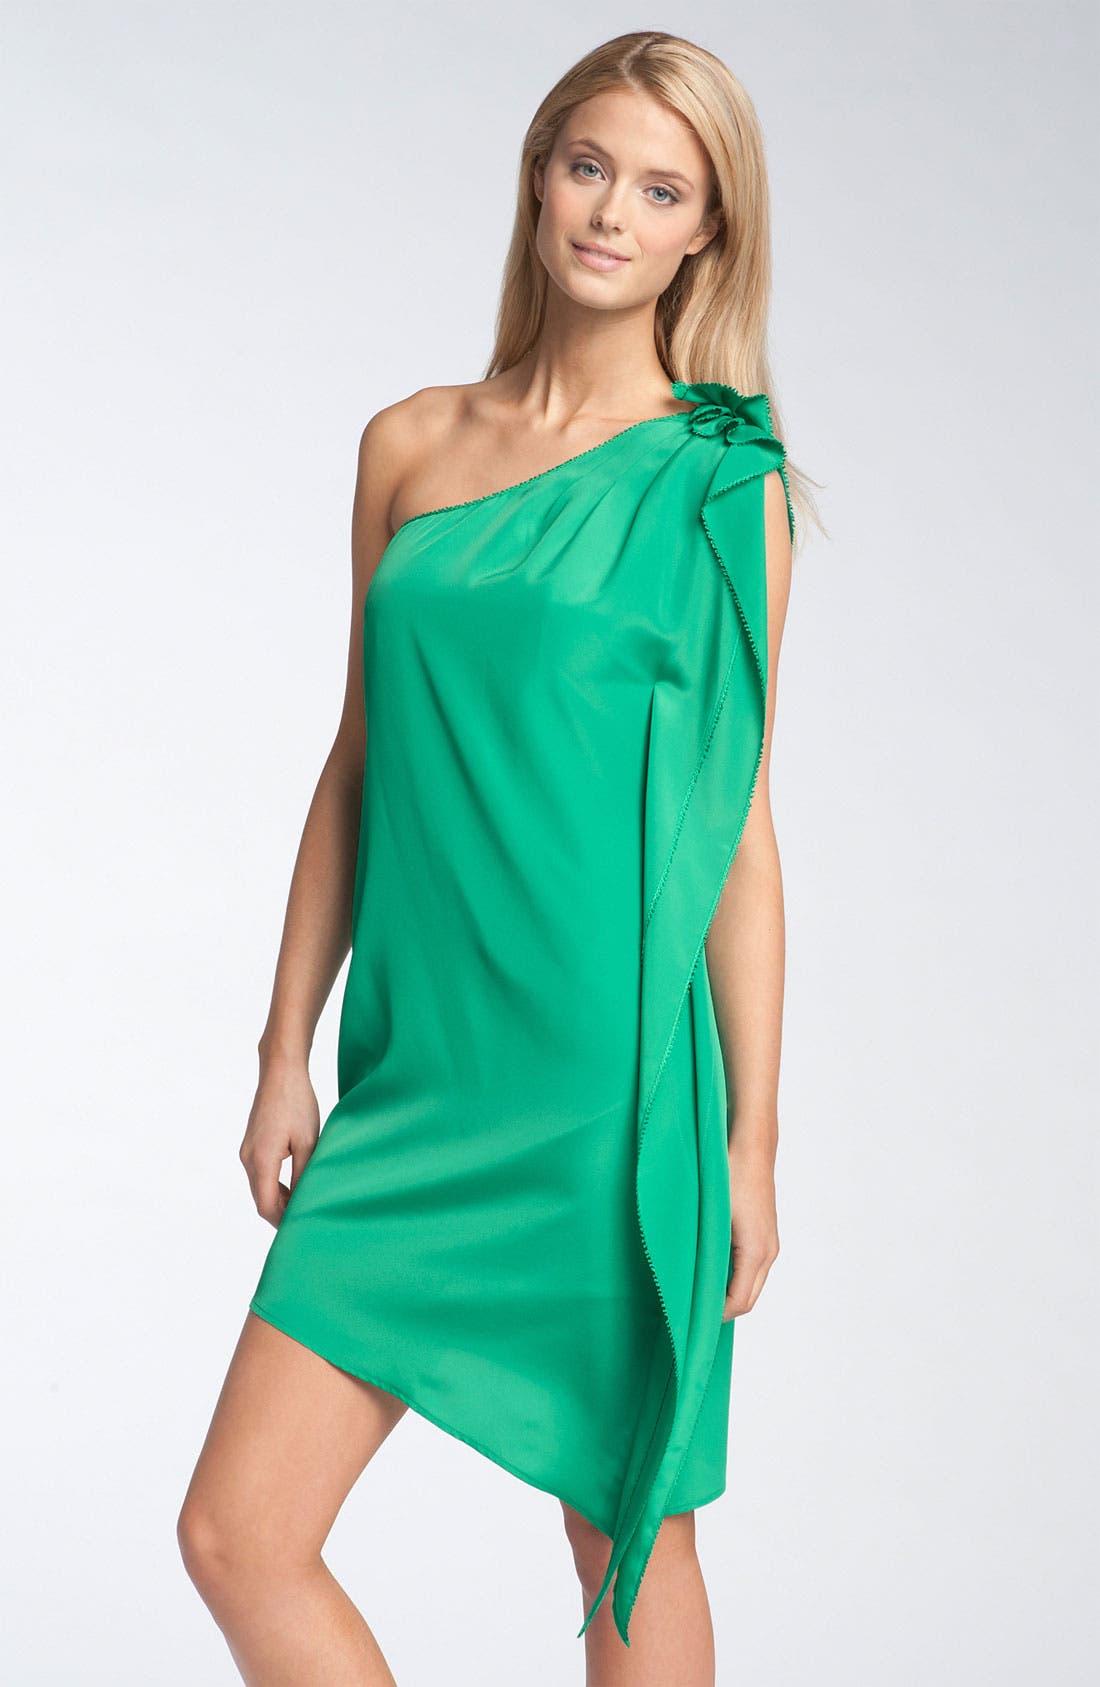 JESSICA SIMPSON One Shoulder Ruffle Dress, Main, color, 310